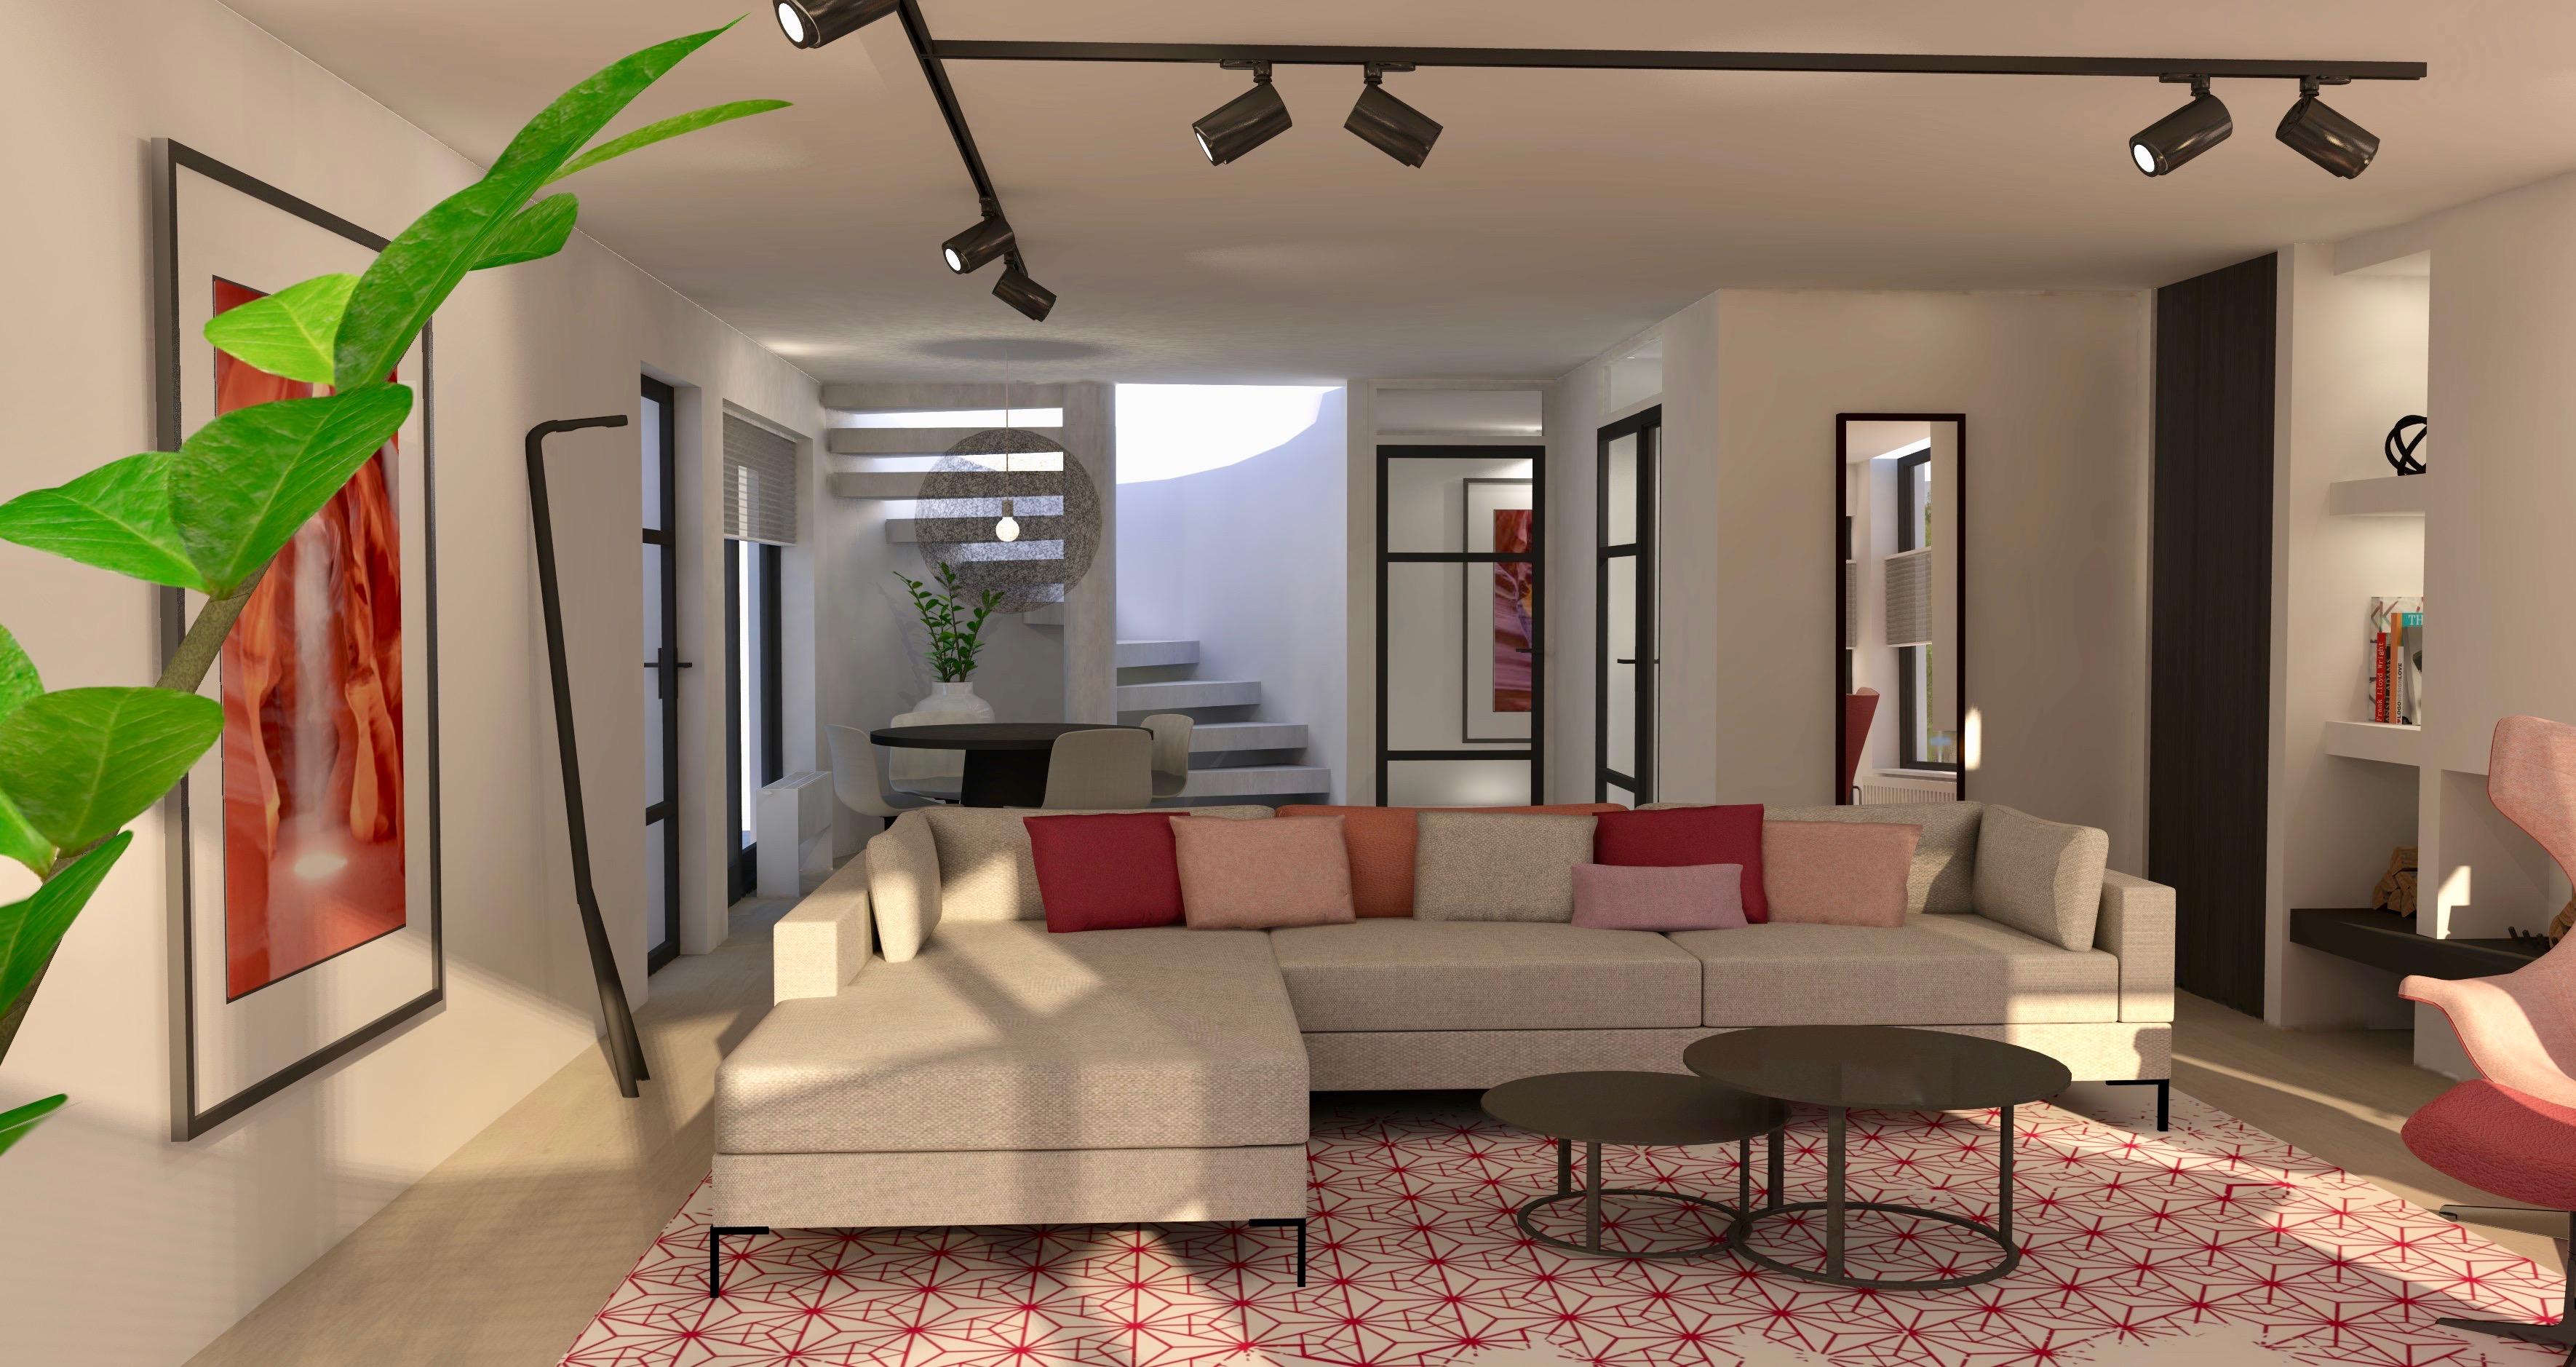 Nieuw project | Restyling woonkamer vrijstaande woning Oosterhout ...